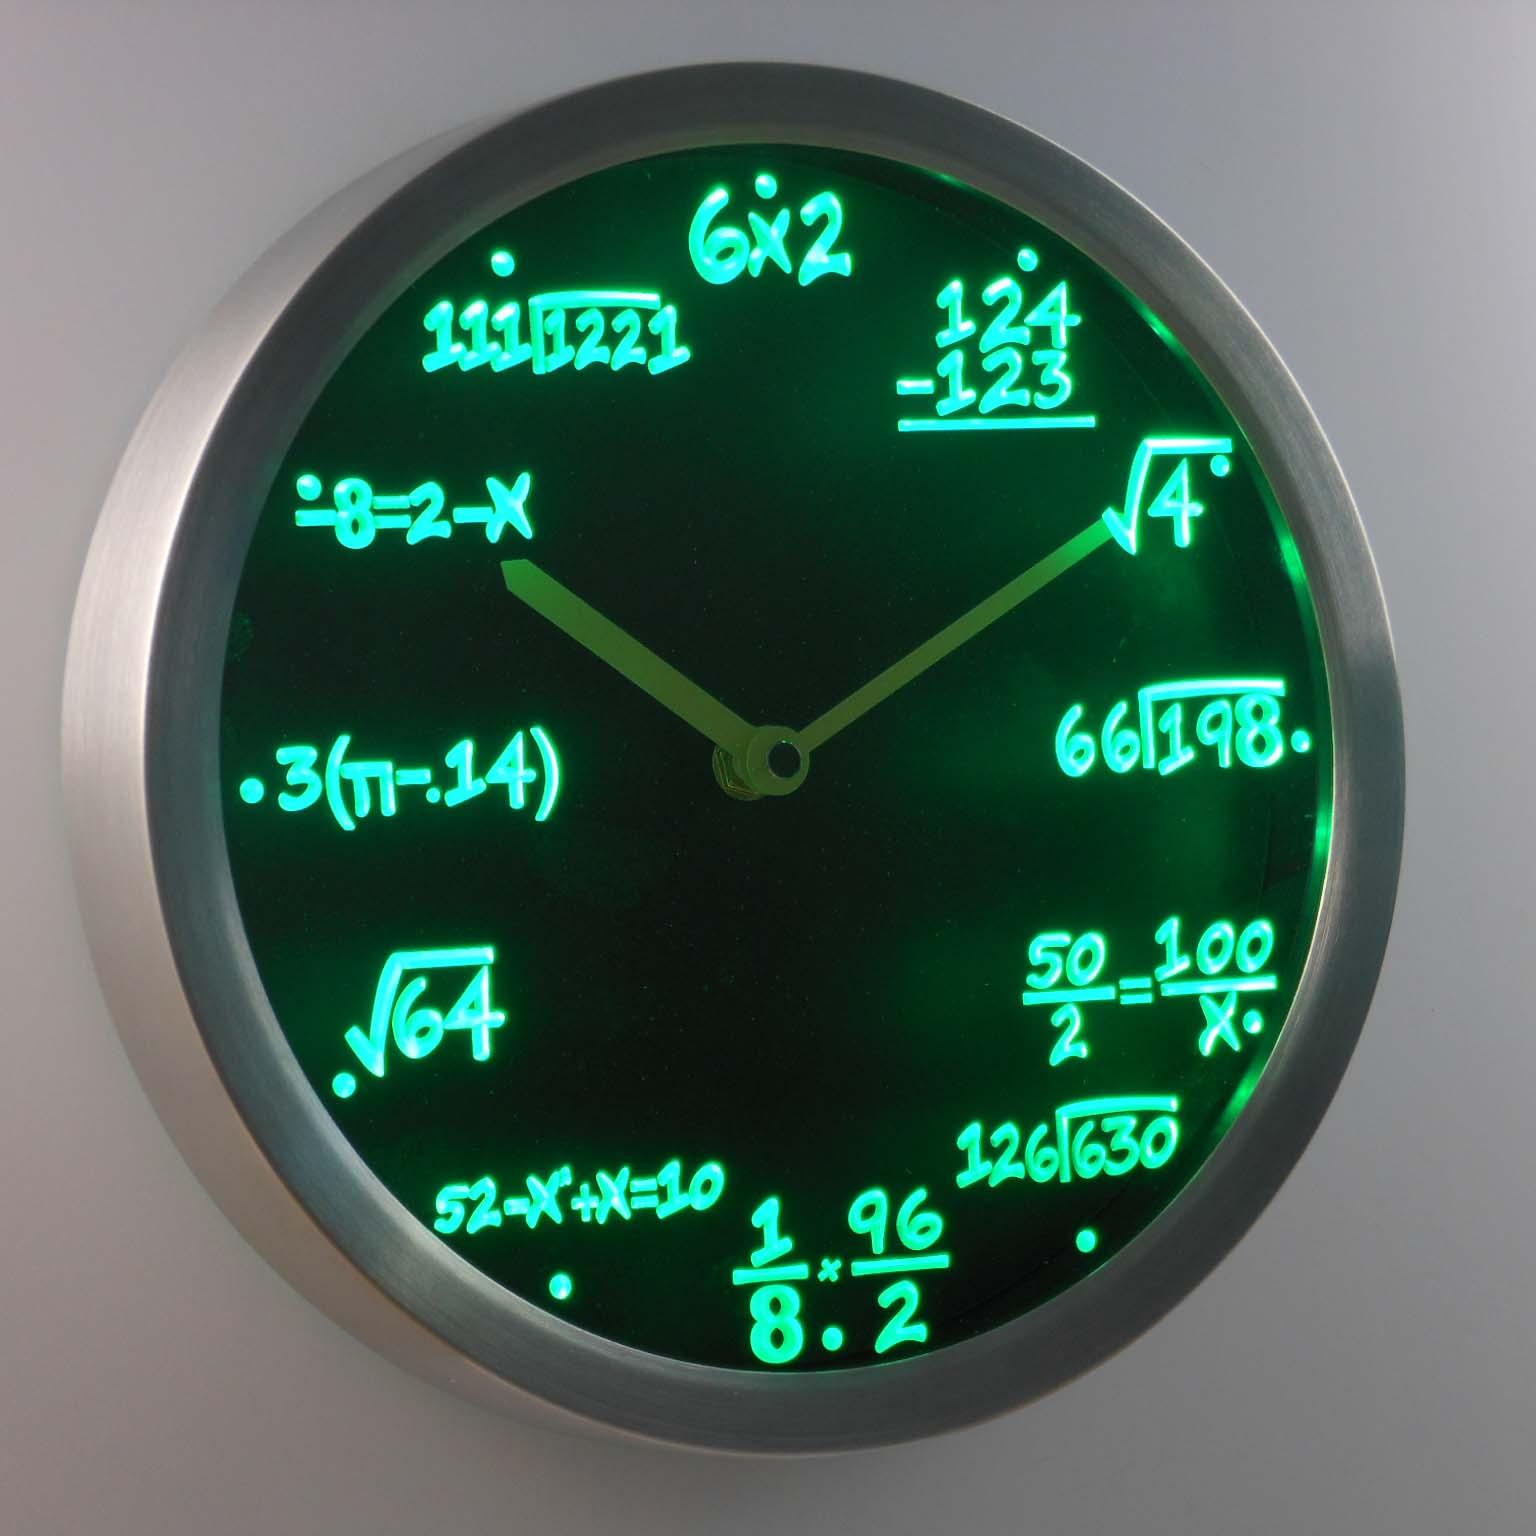 worksheet Clock Math aliexpress com buy nc0461 math class algebra formula mathematics teacher gift neon led wall clock from reliable keyring